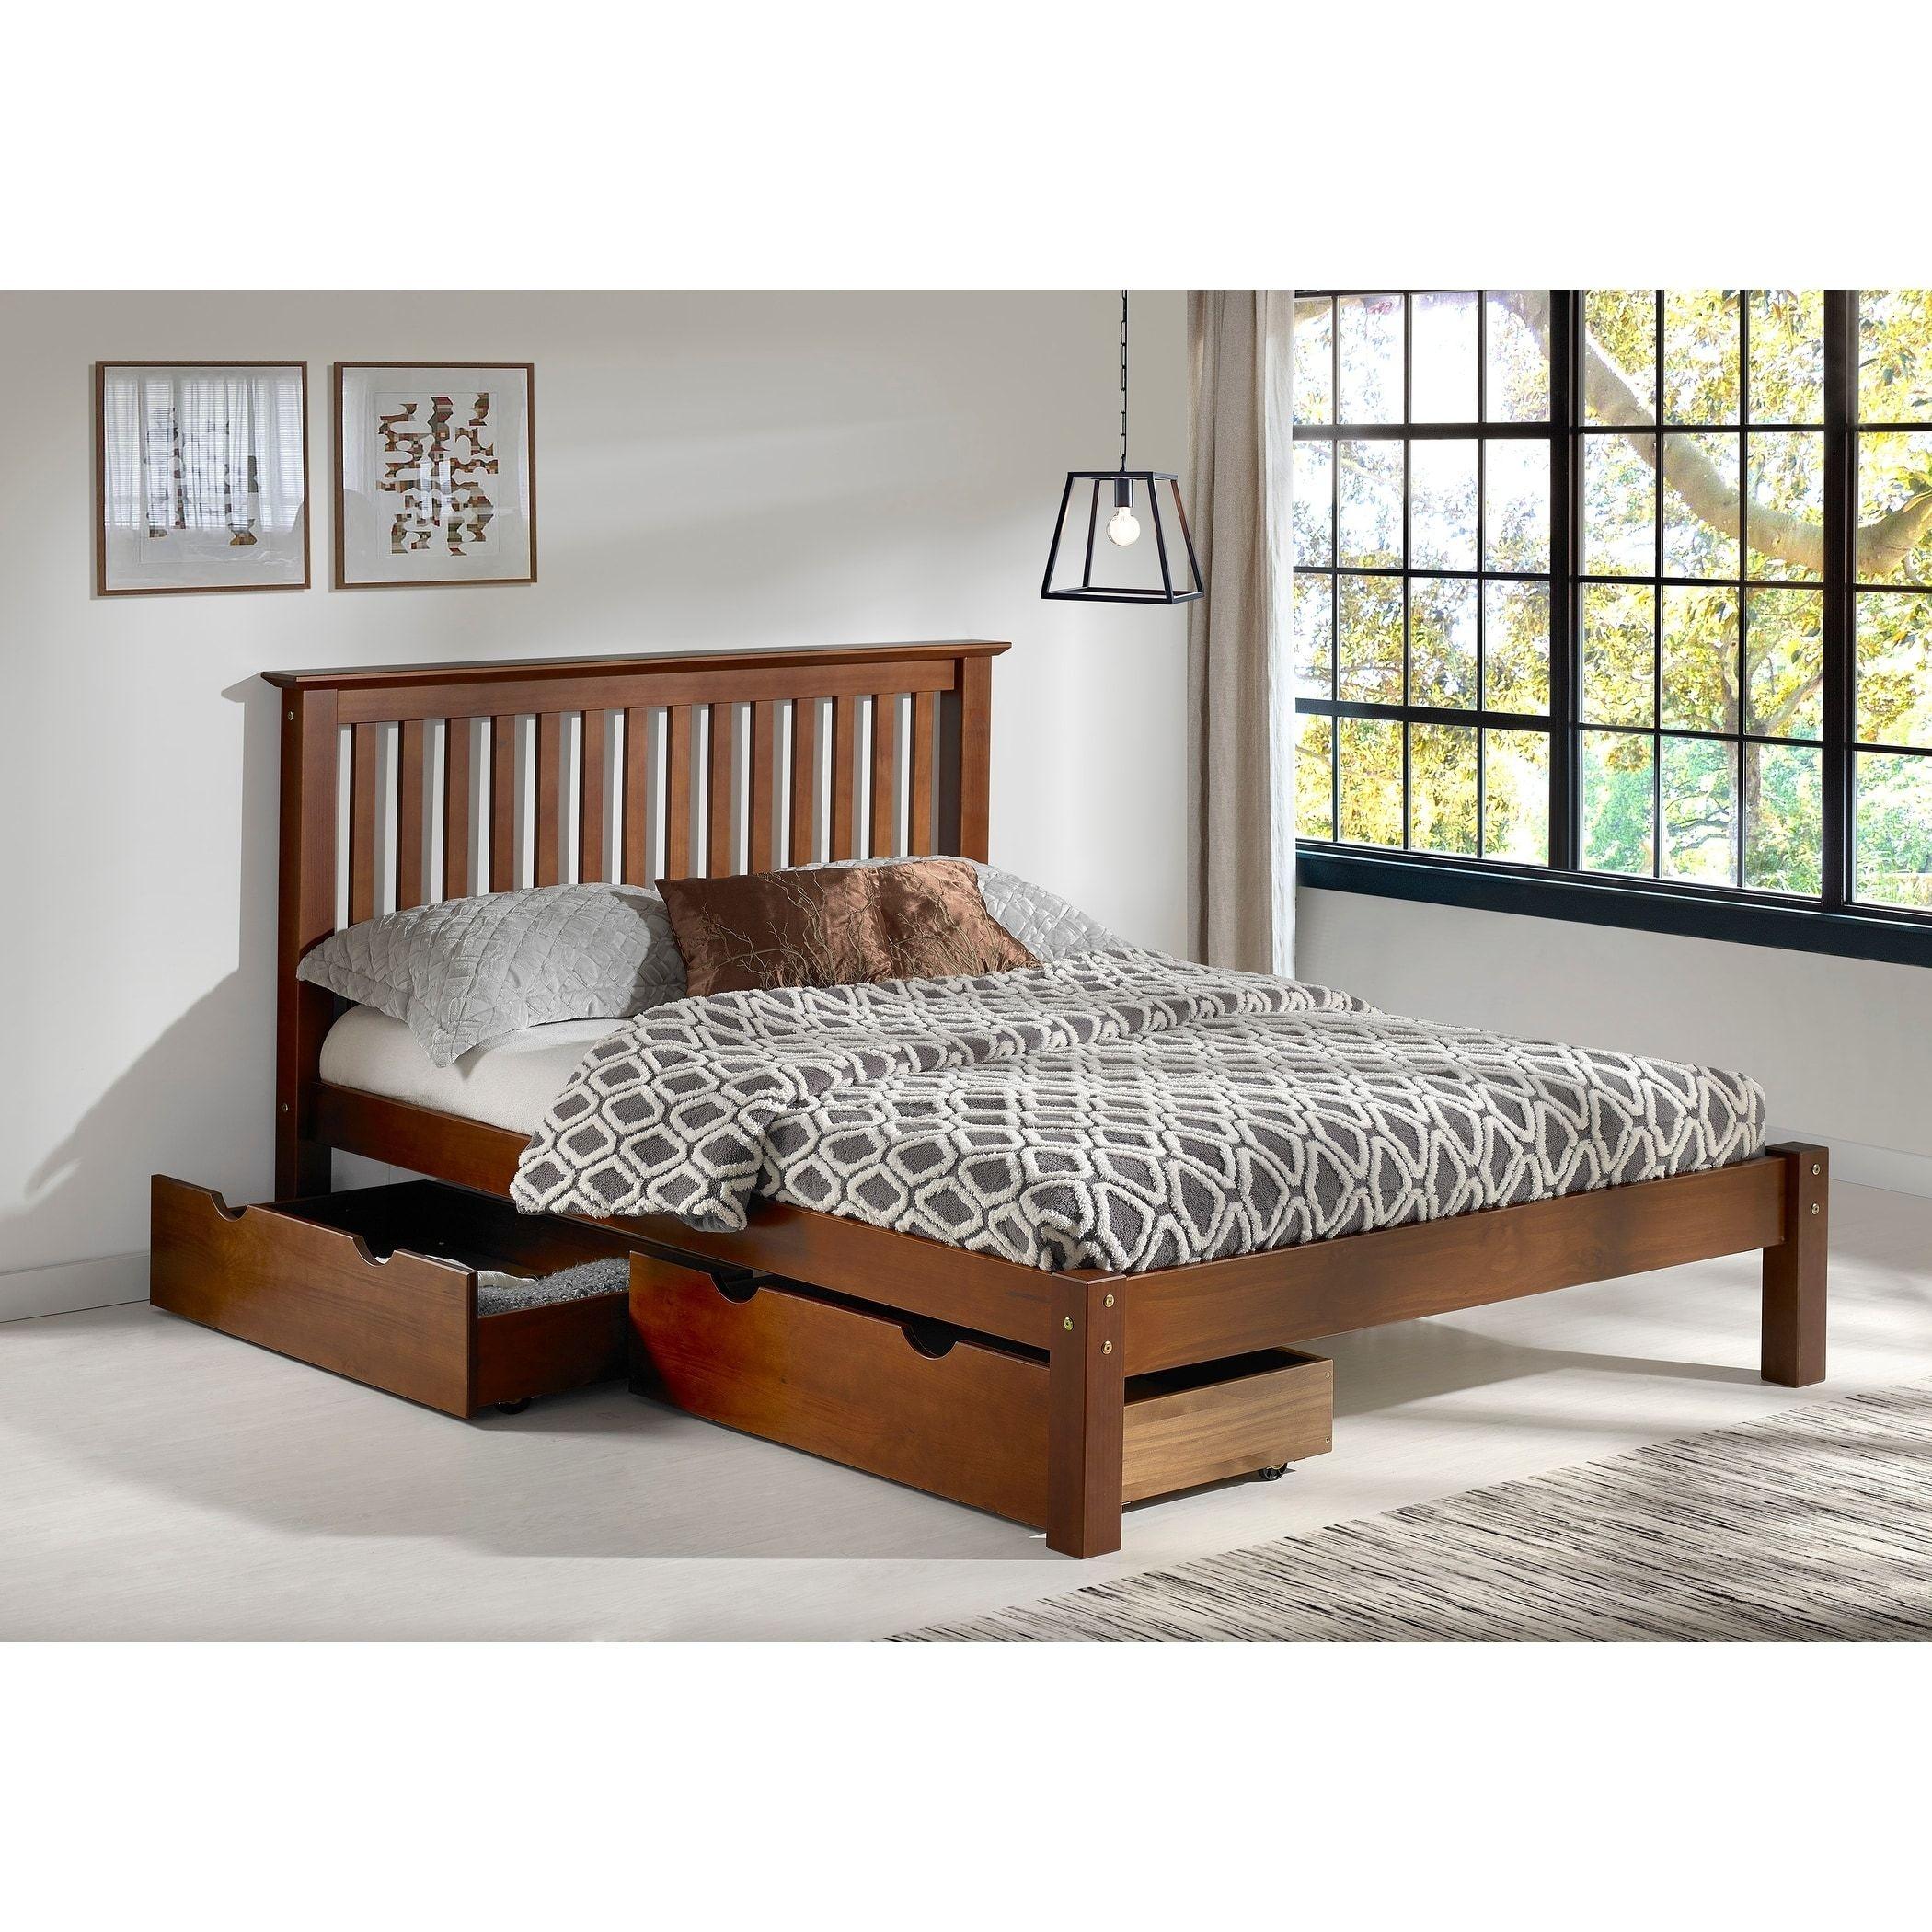 Bolton Furniture Girona Chestnut Brazilian Pine Queen-size Storage Bed, Brown